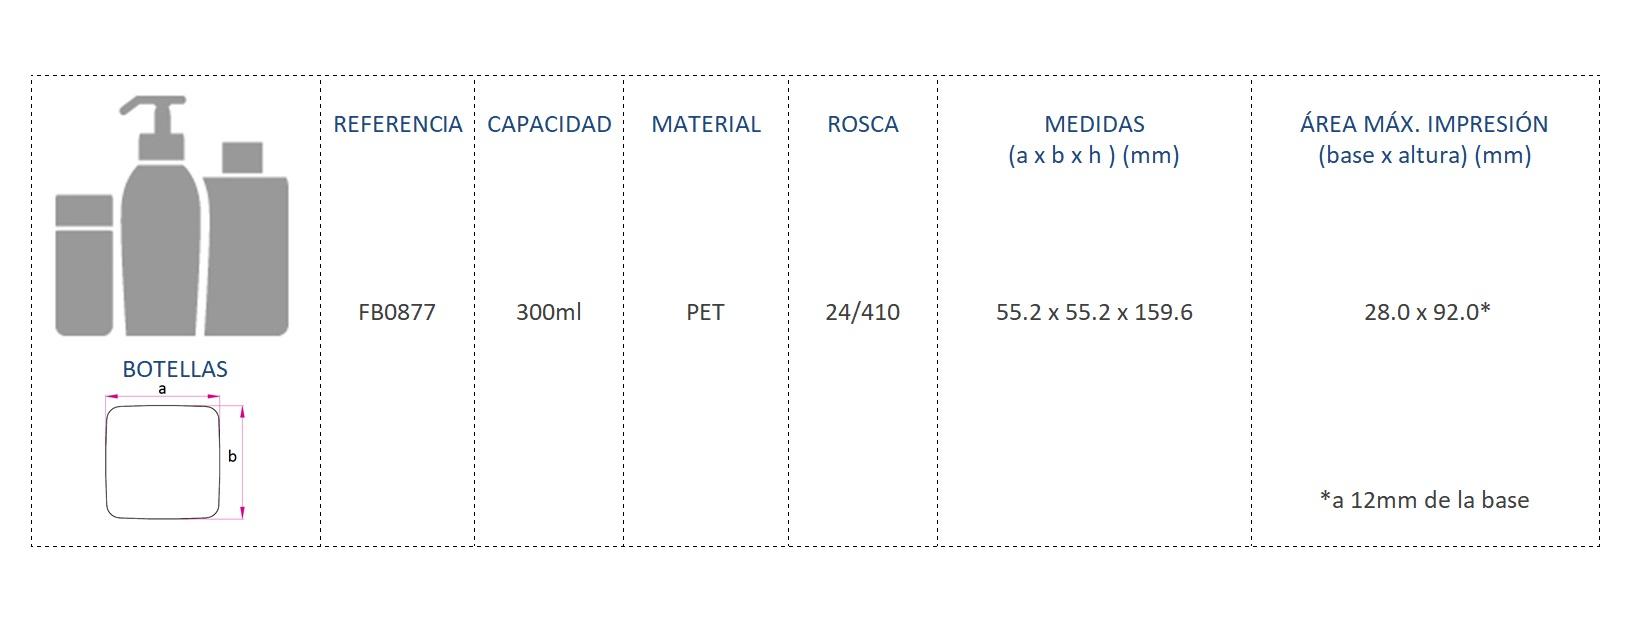 Cuadro de materiales botella FB0877